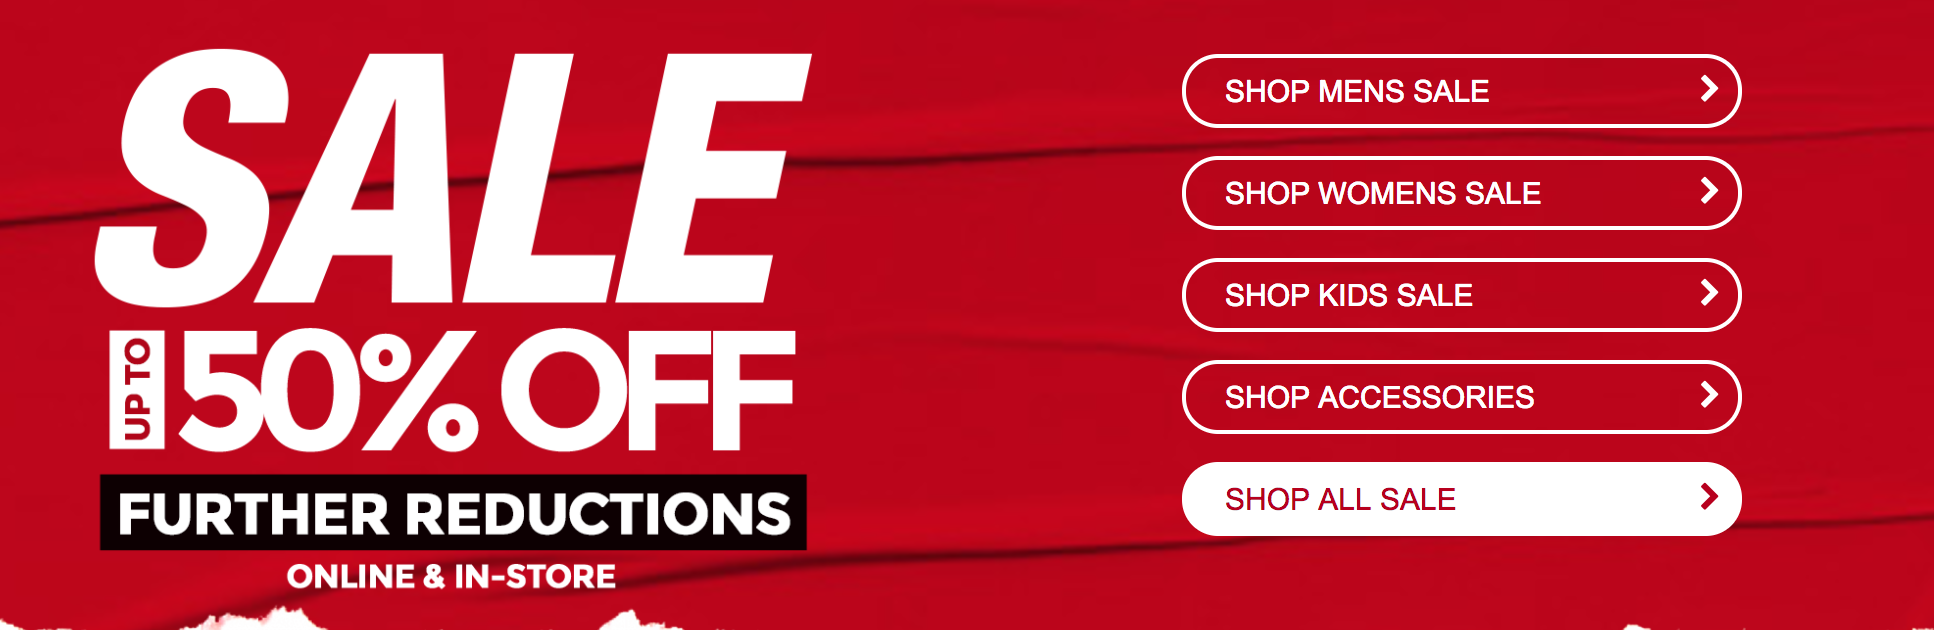 Footasylum: Sale up to 50% off shoes